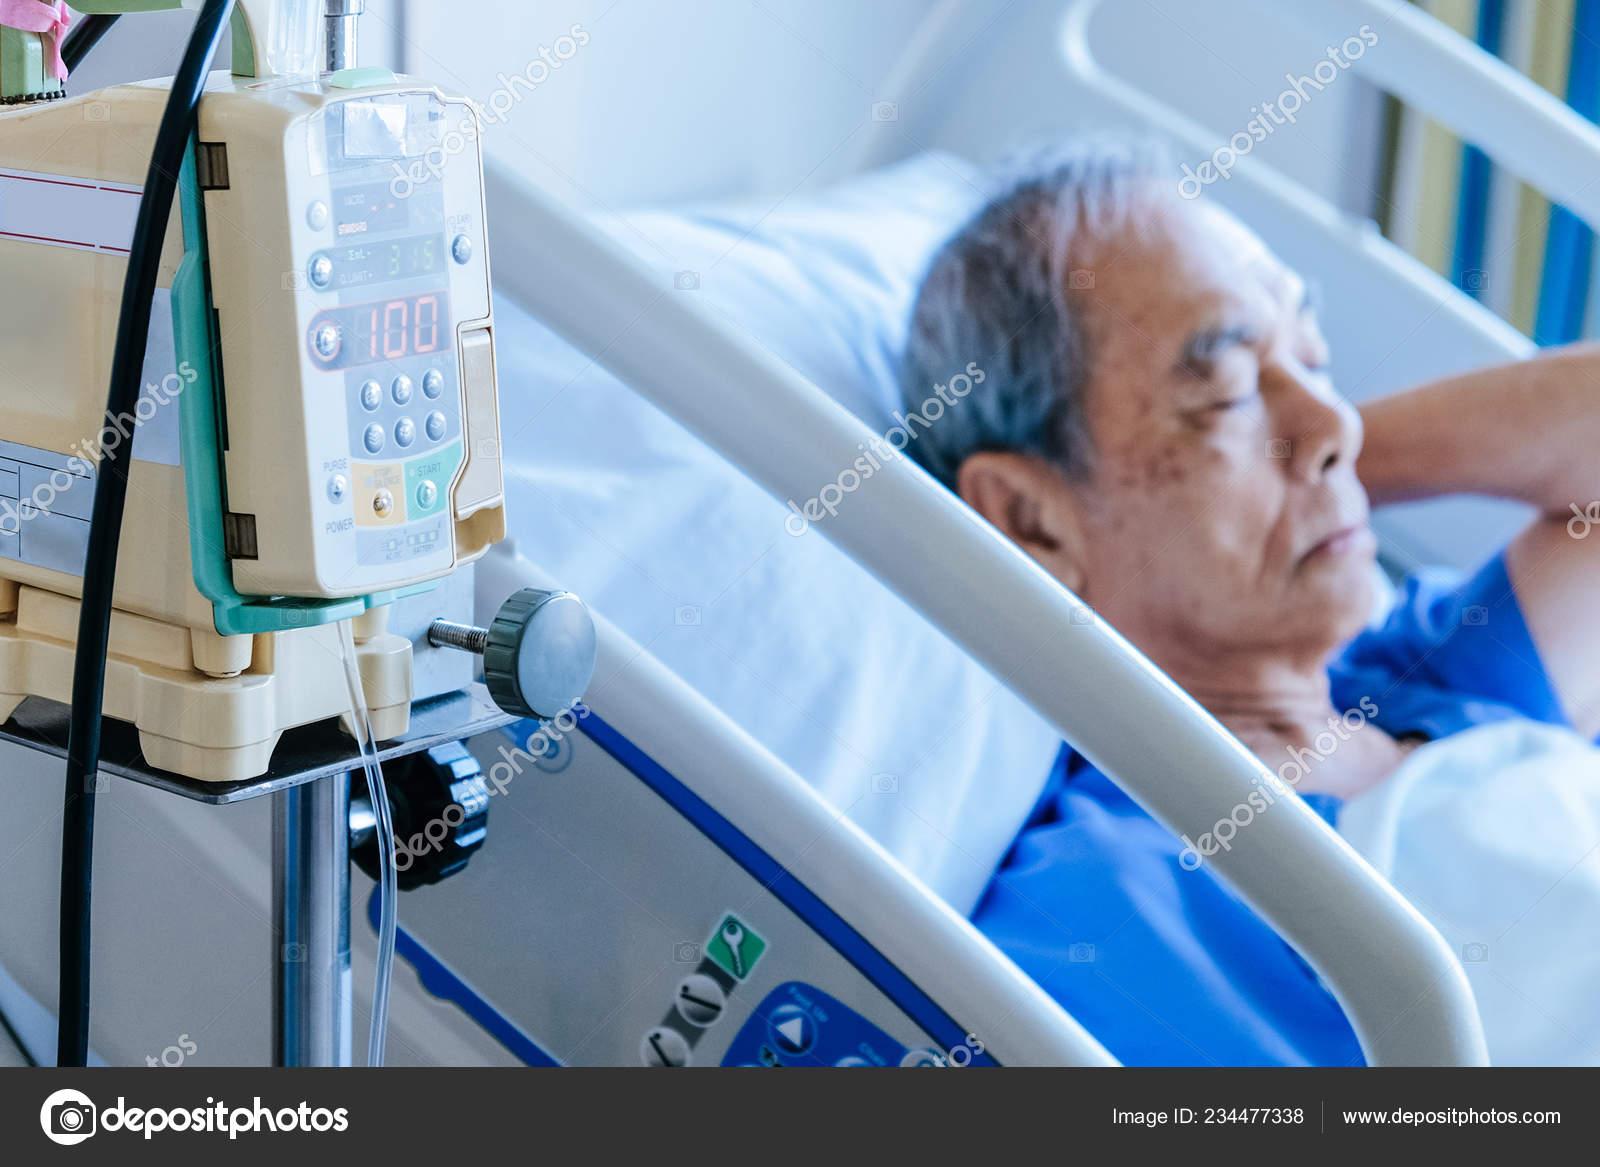 hospital-infusion-pump-penetration